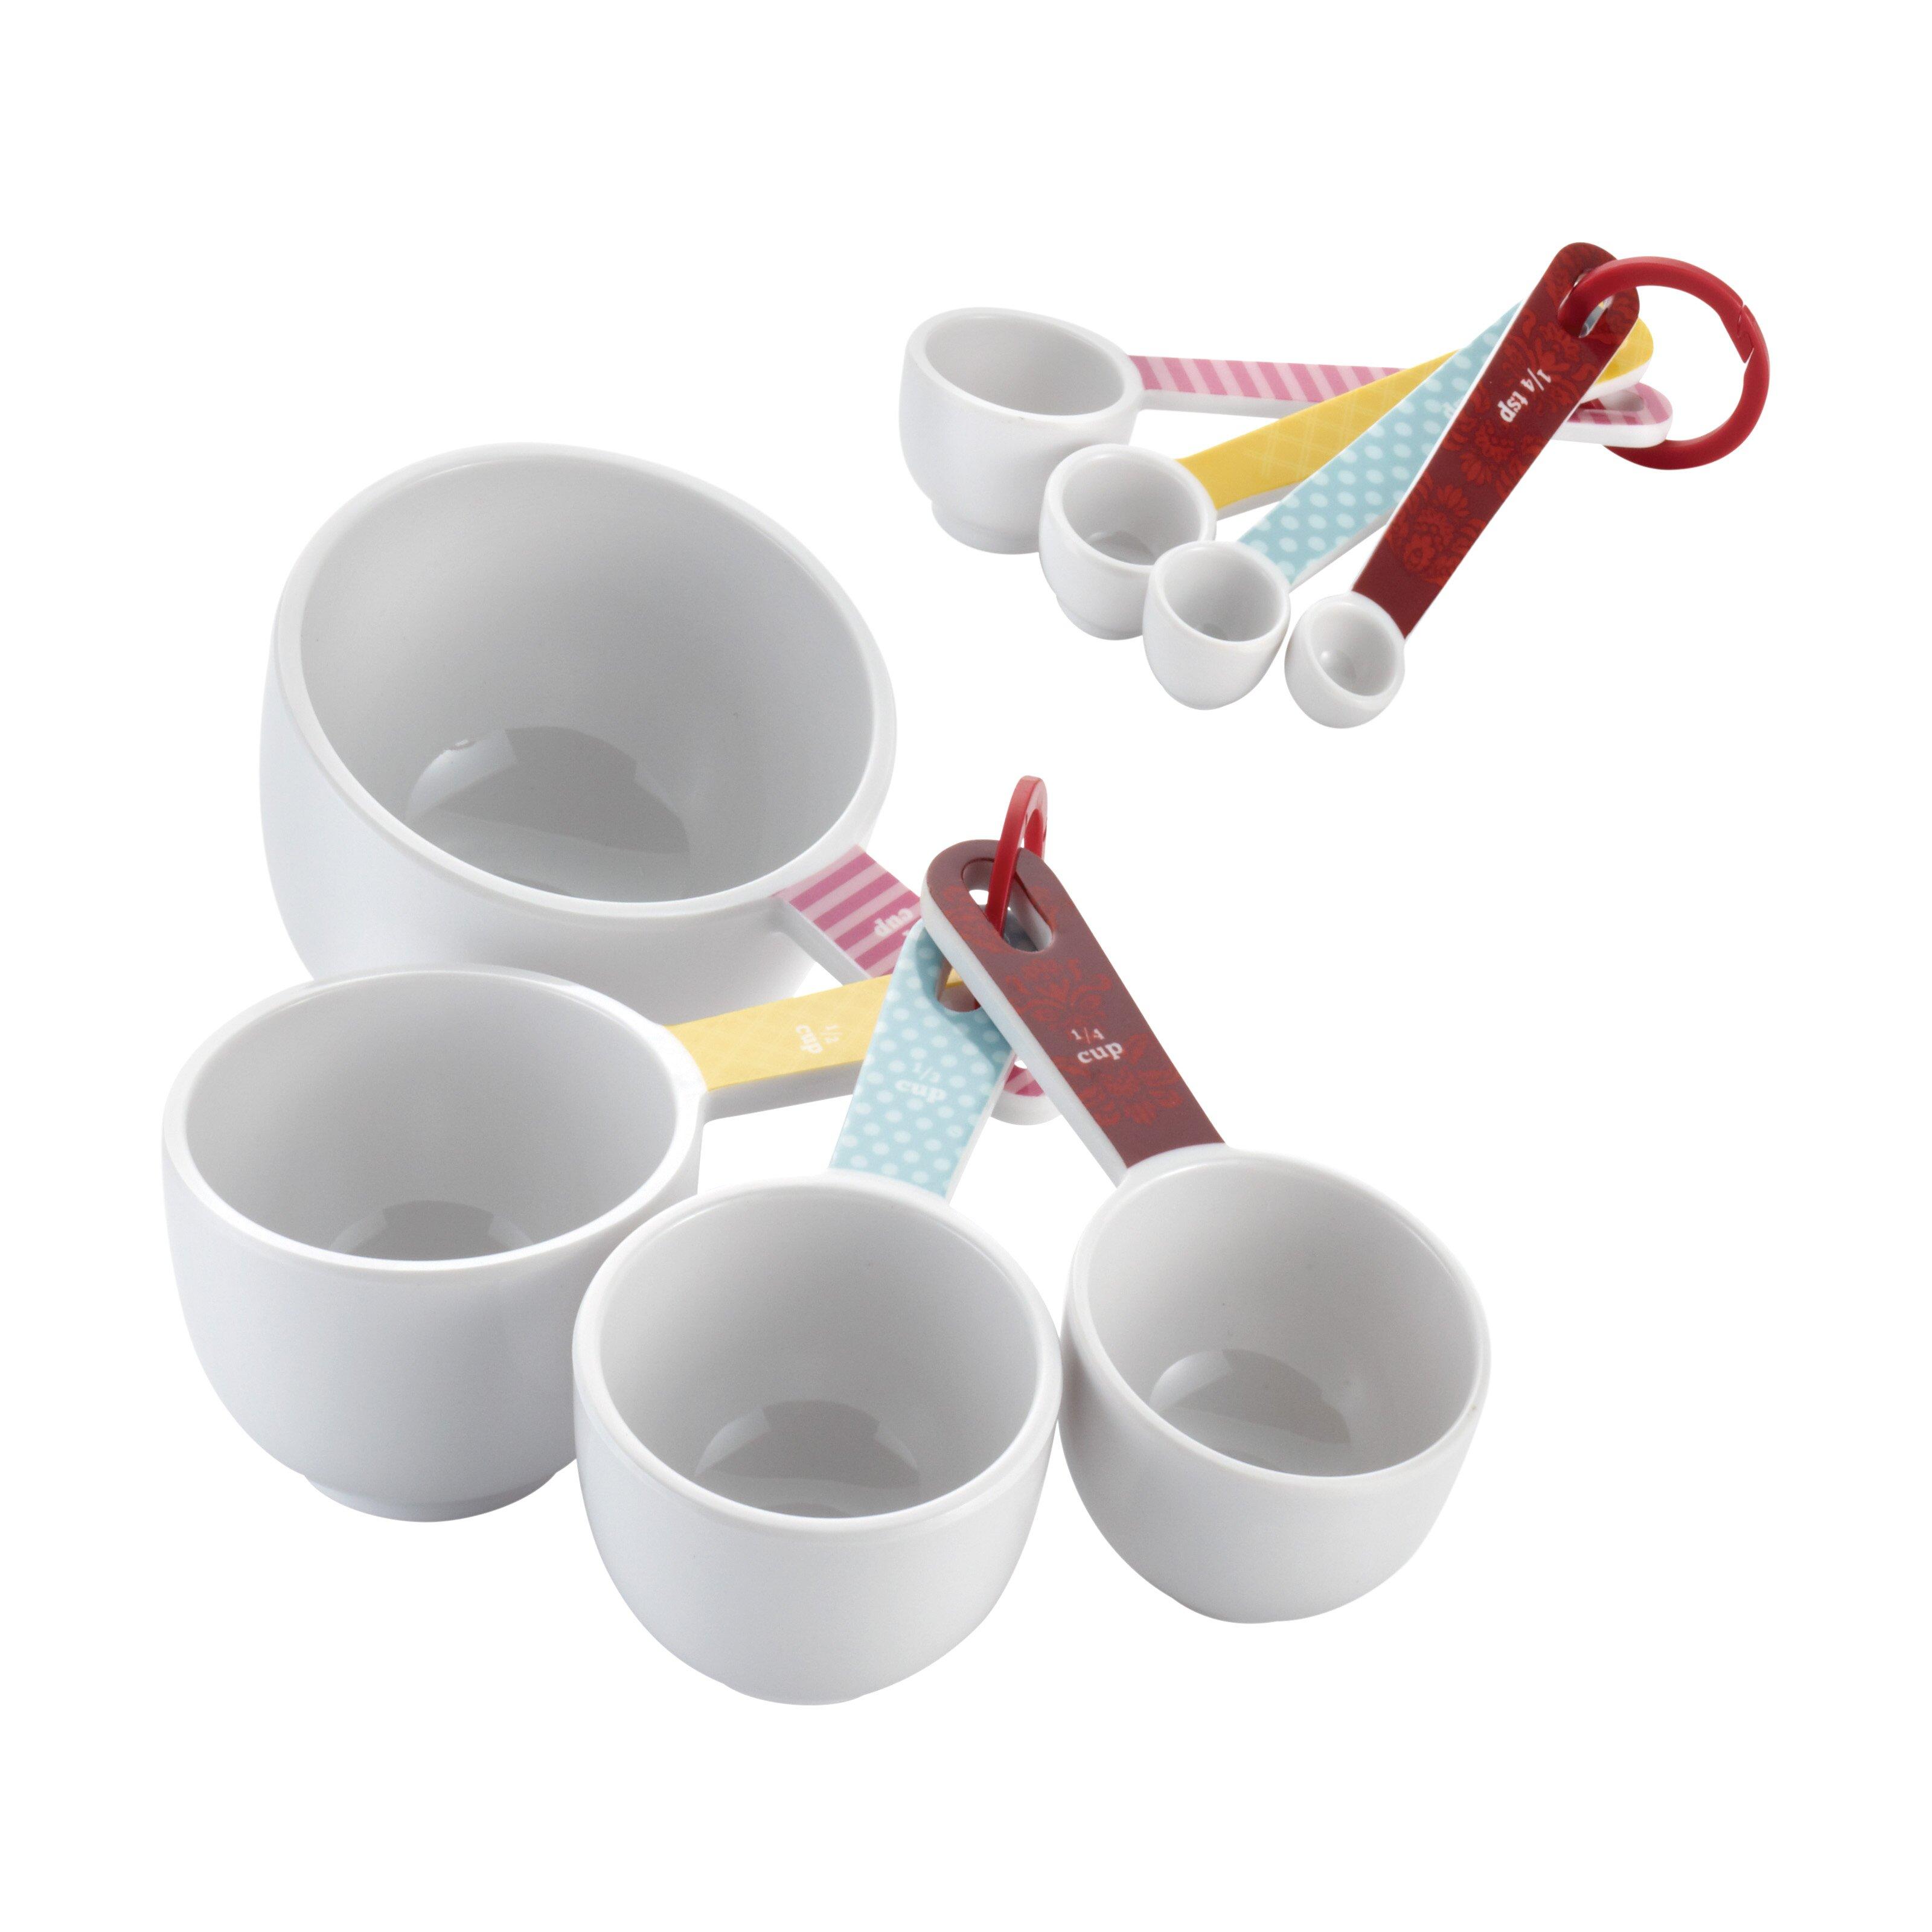 cake boss countertop accessories 8 piece measuring cup spoon set reviews wayfair. Black Bedroom Furniture Sets. Home Design Ideas